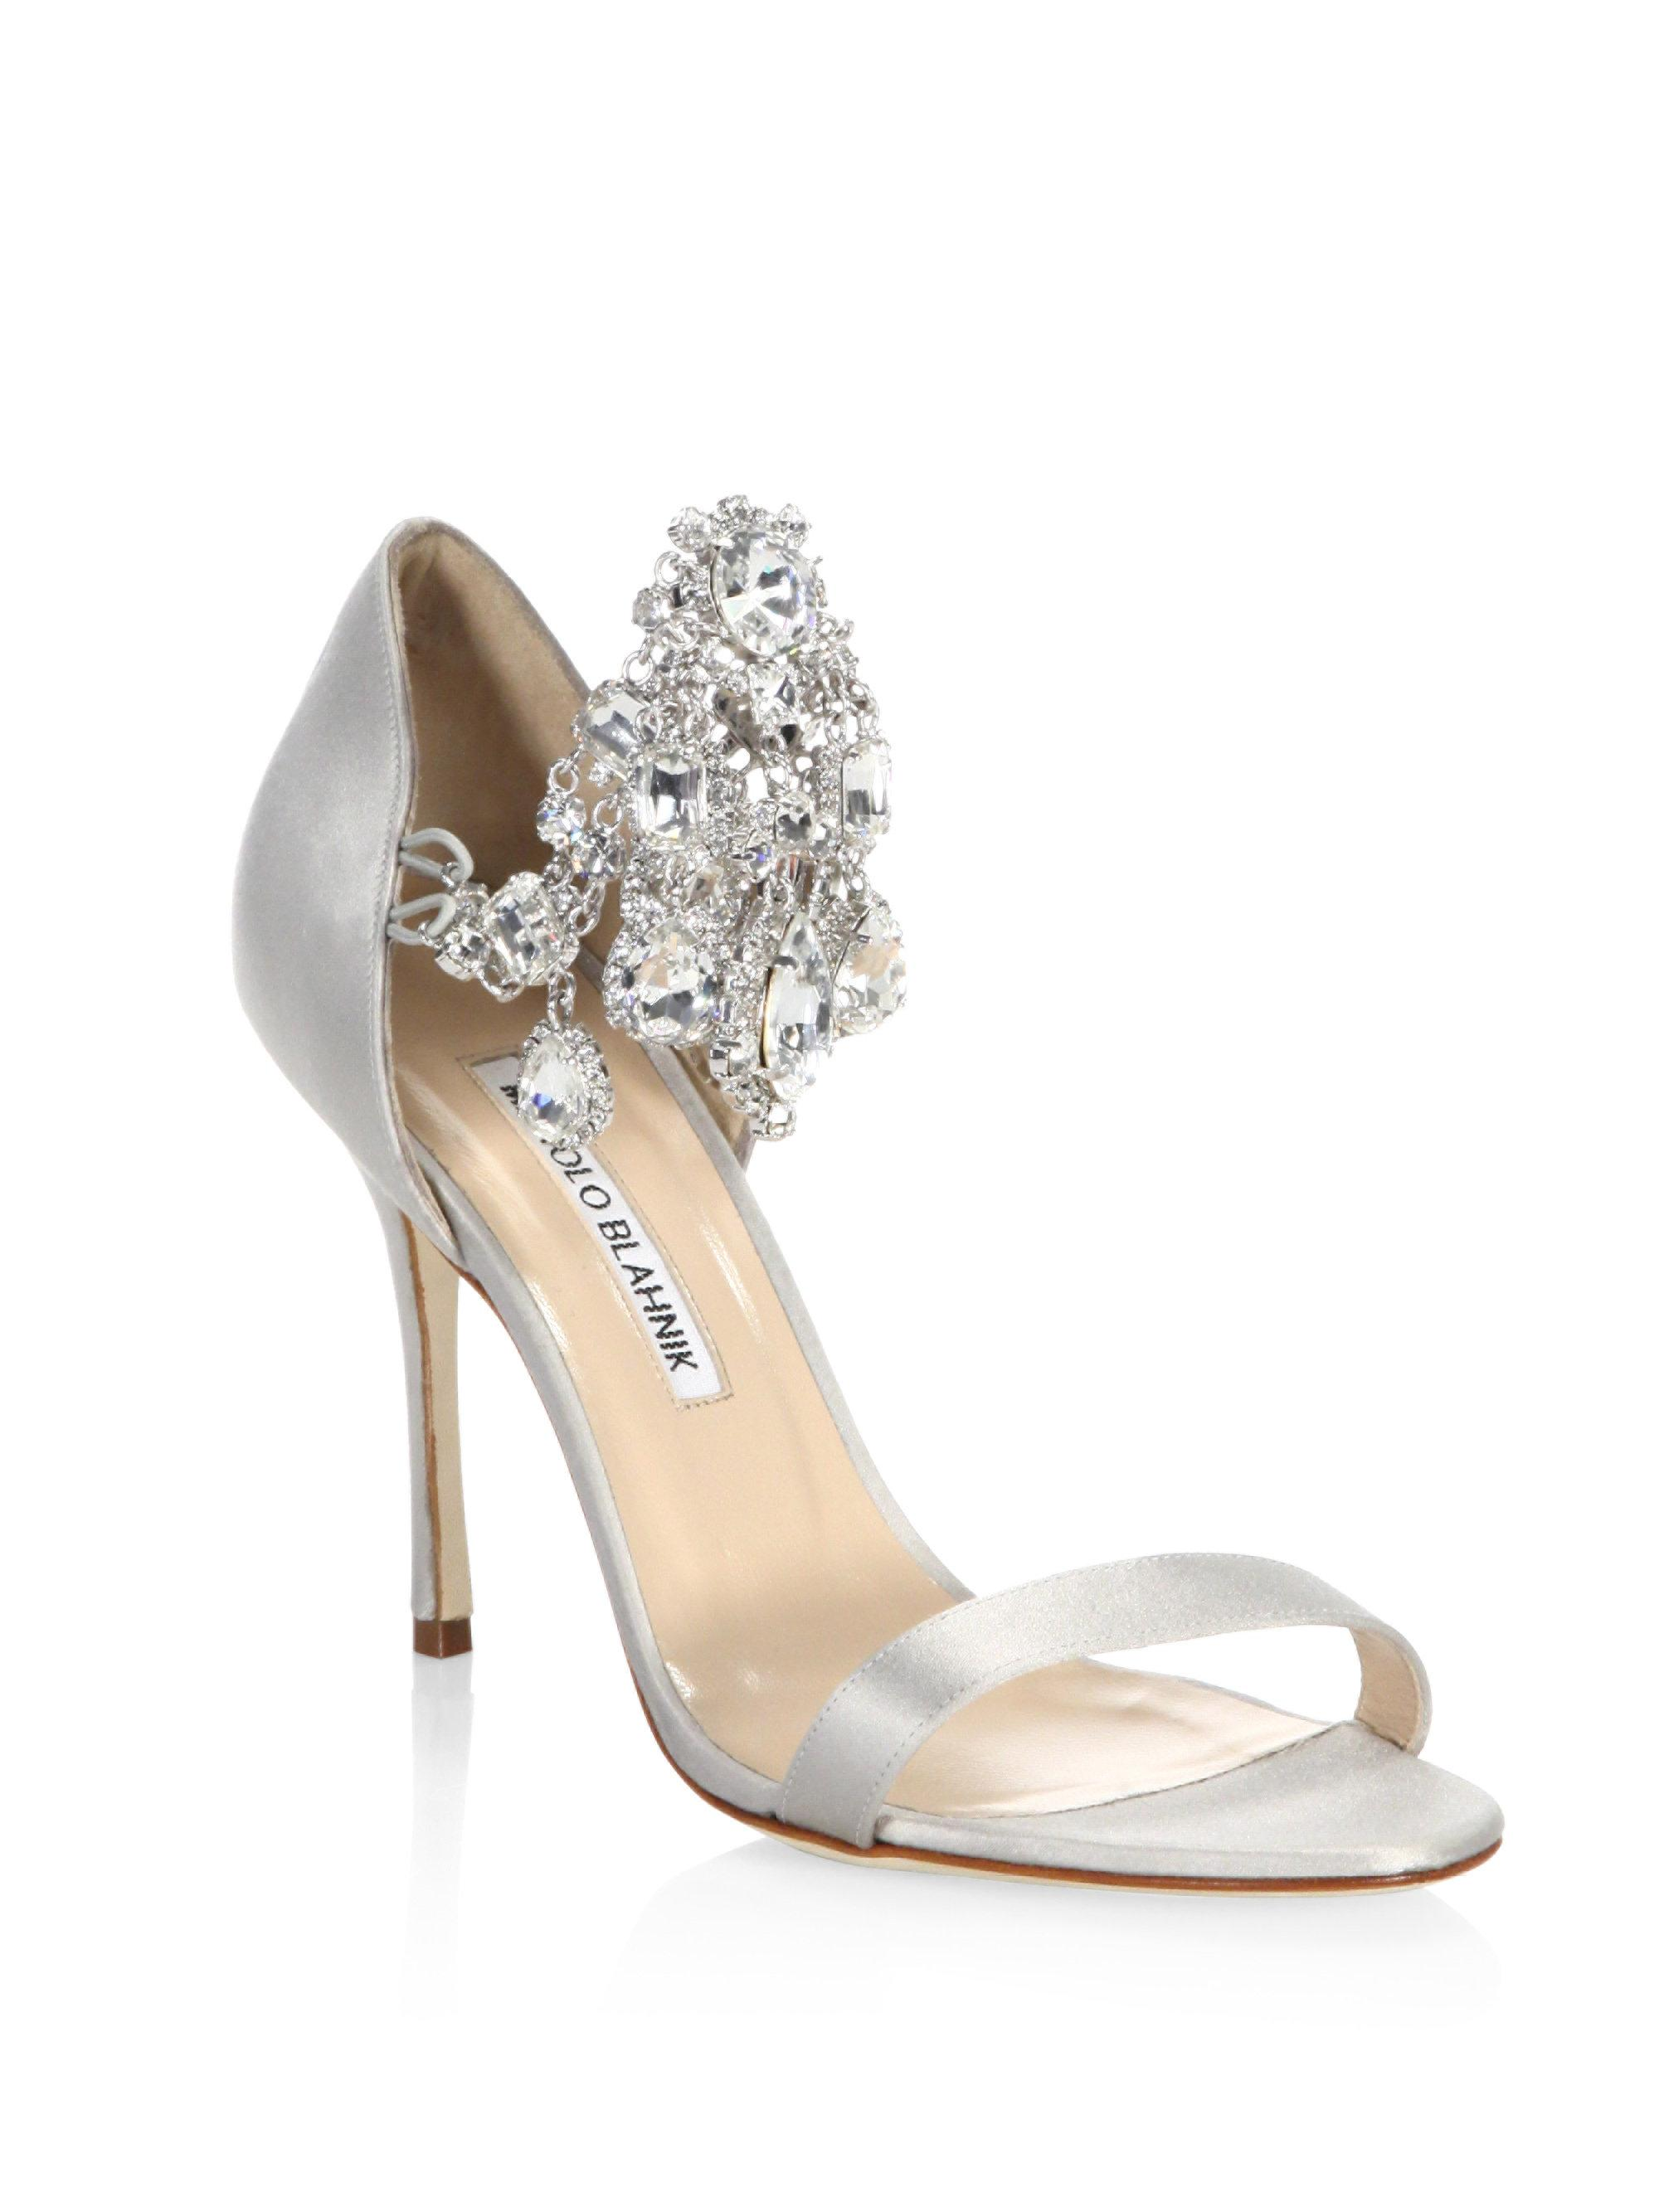 Manolo Blahnik Ivory And Black Cap Toe Guingla Diamond: Manolo Blahnik Zullinsan Embellished Satin Sandals